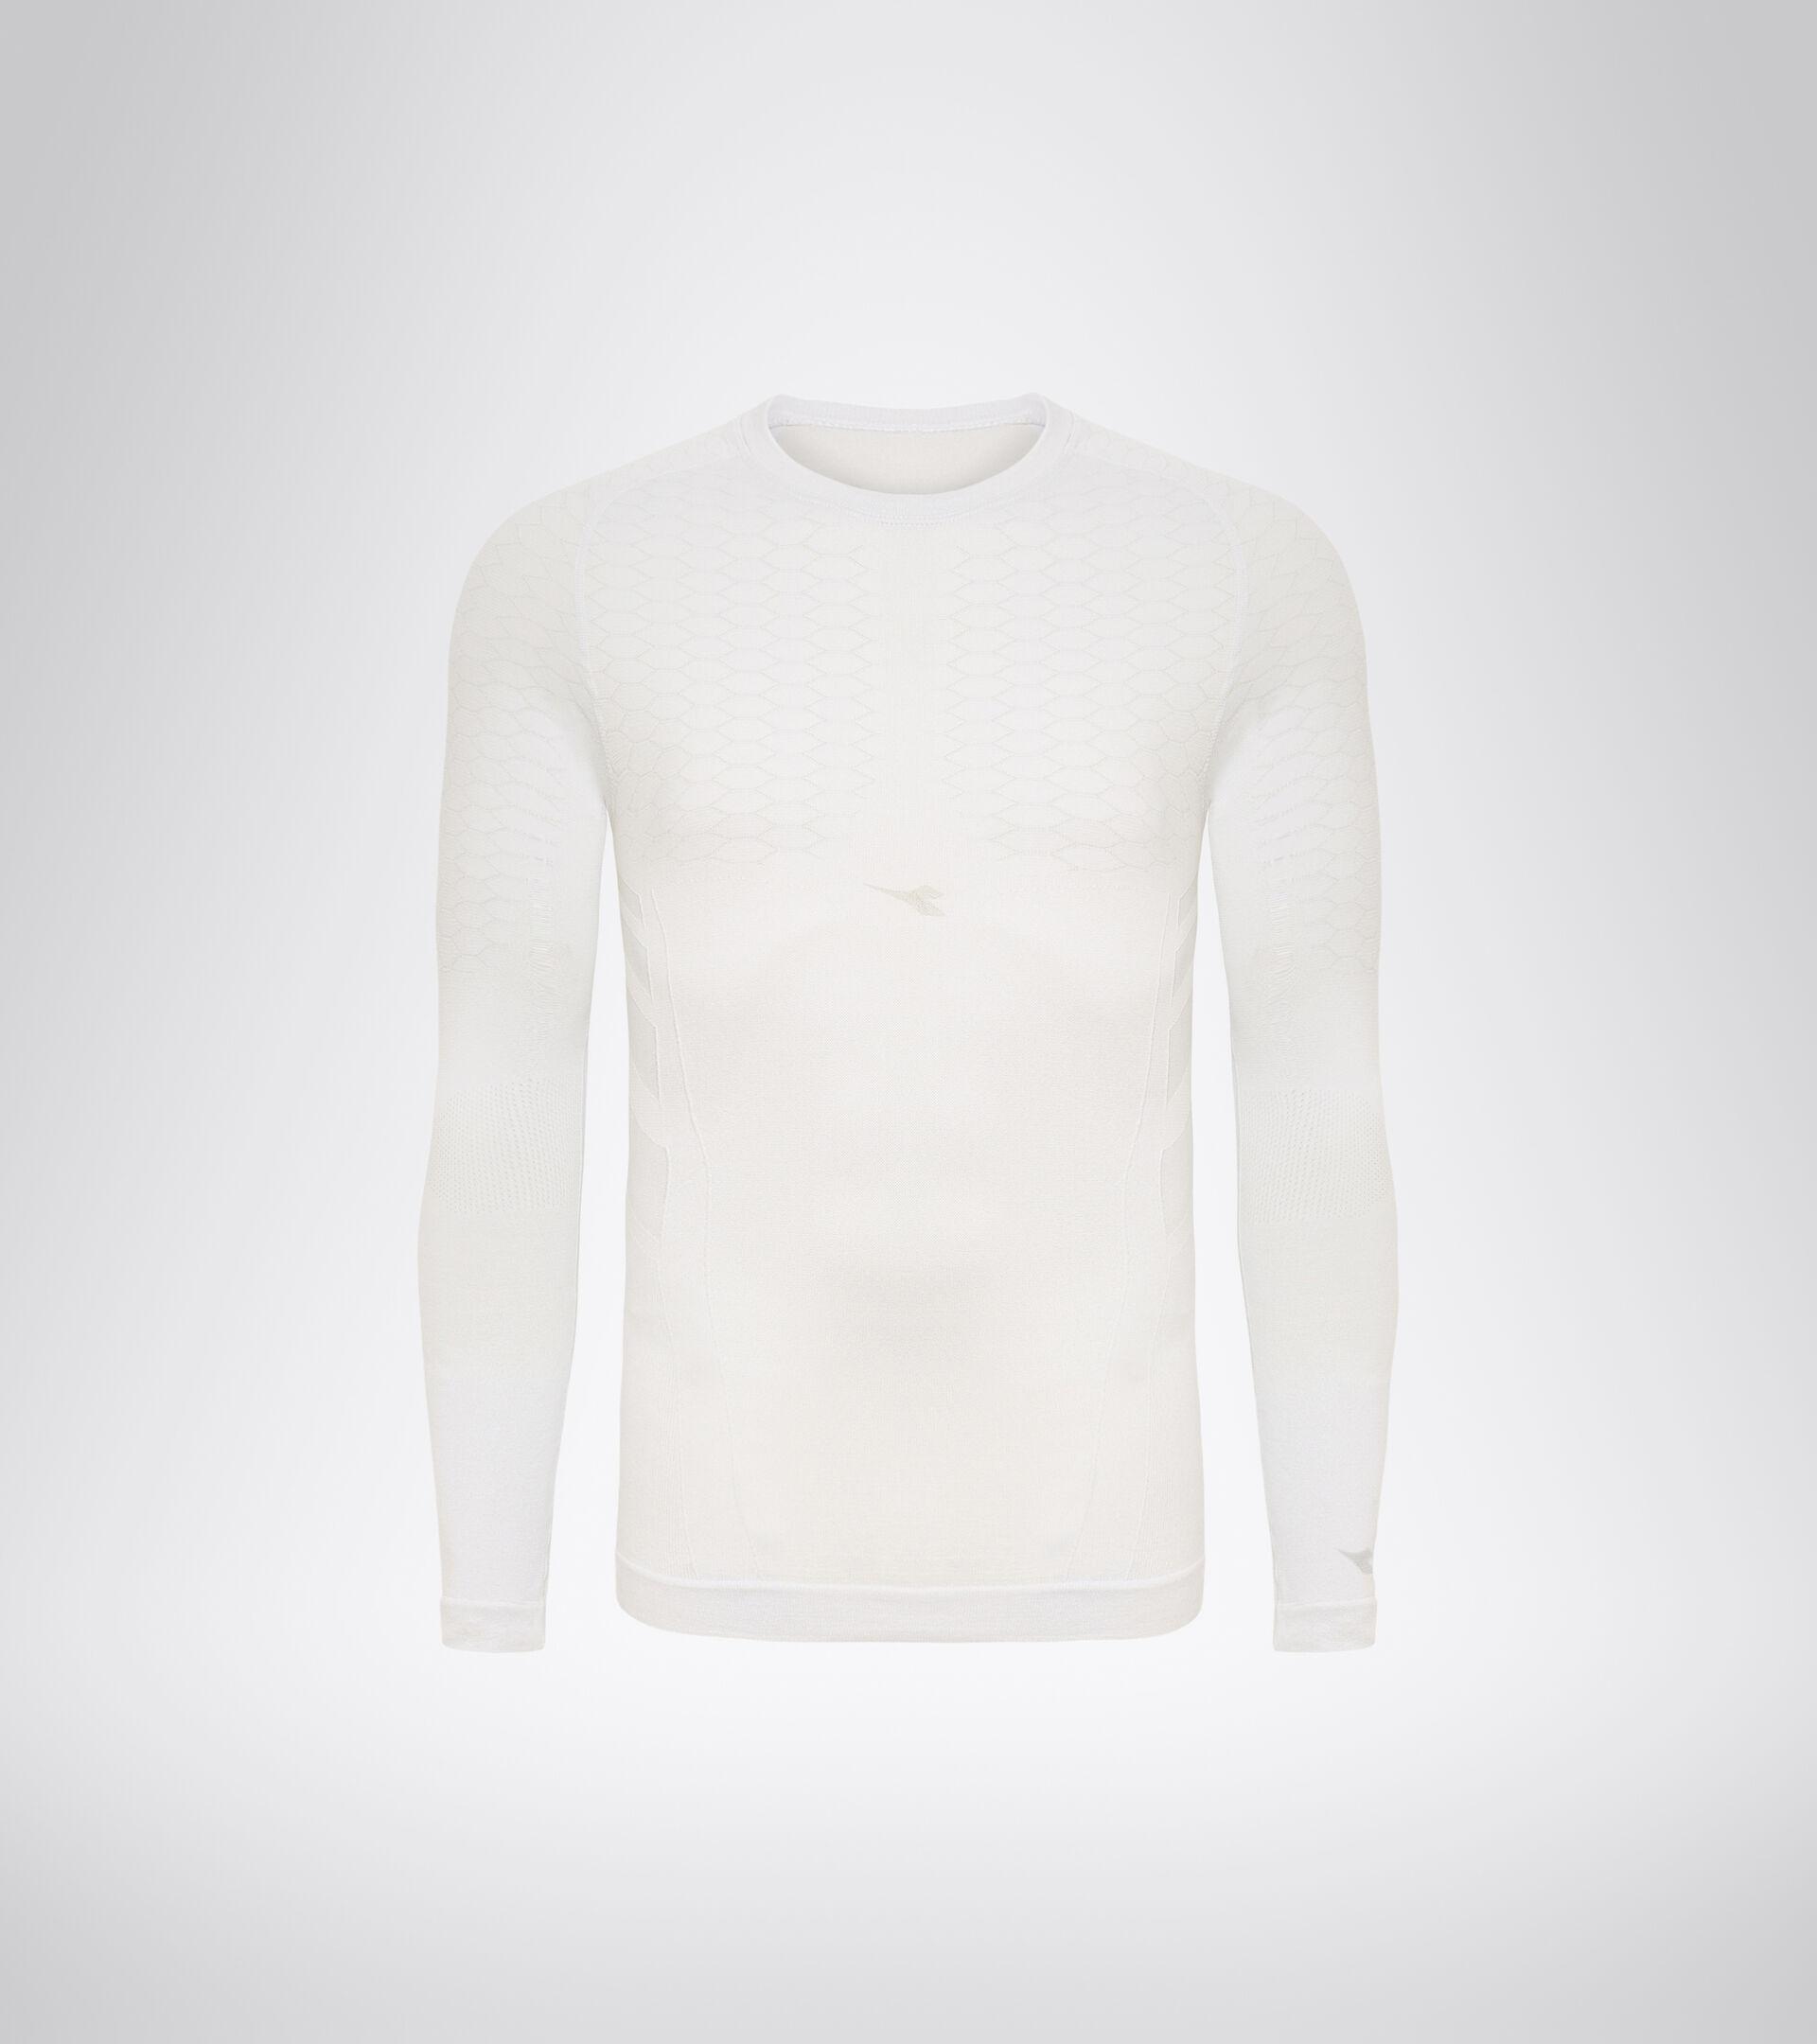 Long-sleeved training t-shirt - Men LS T-SHIRT ACT OPTICAL WHITE - Diadora